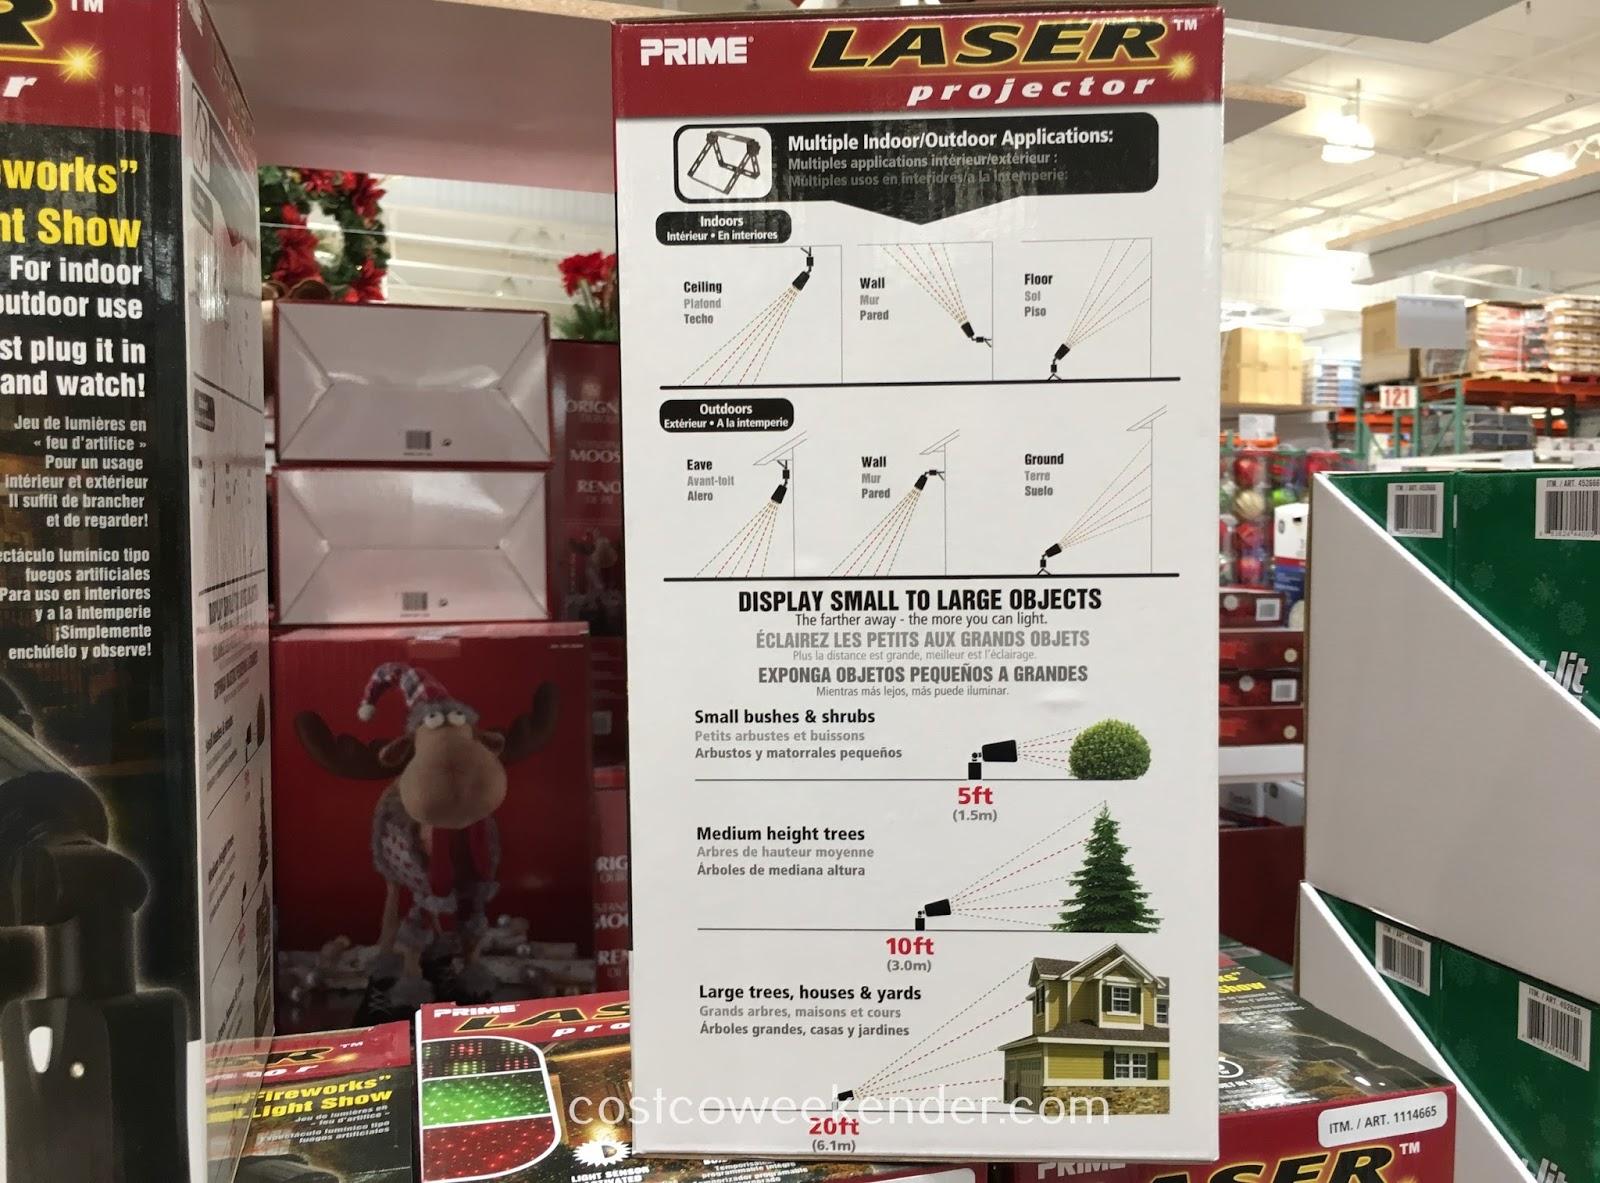 Prime Laser Projector (model LFLRGM505) | Costco Weekender